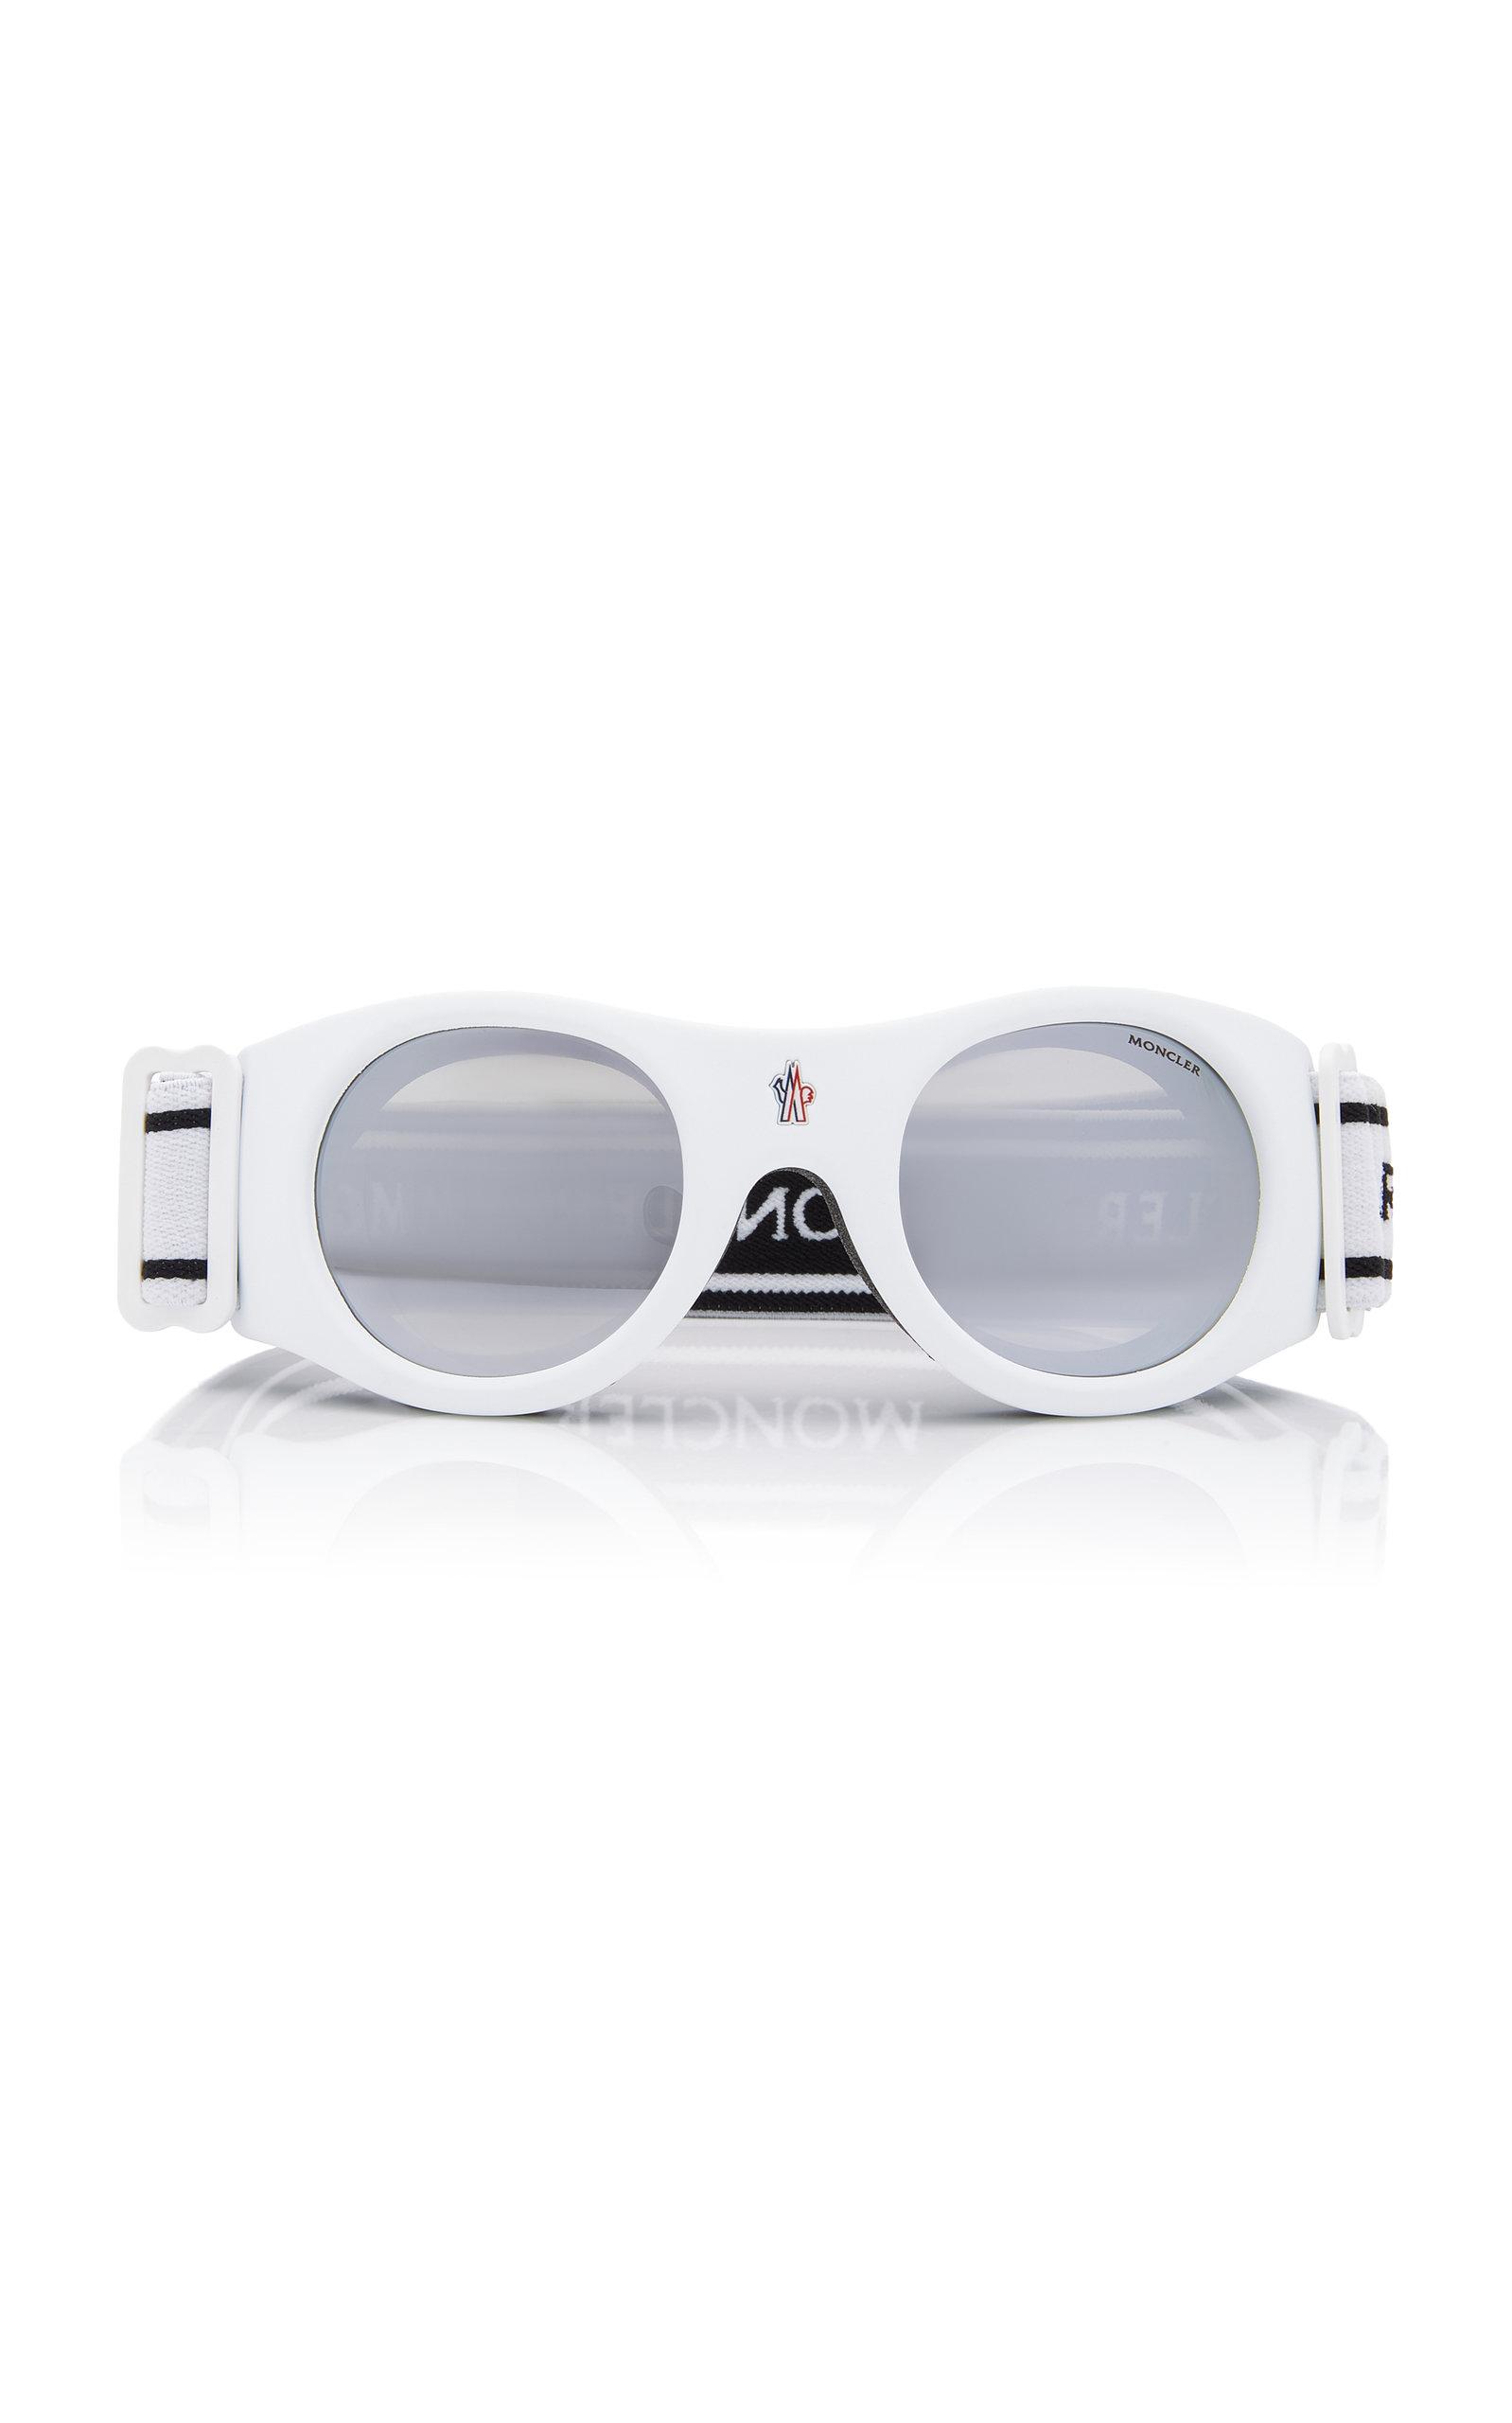 f02d232a614 Moncler Sunglasses Round-Frame Ski Goggles In White